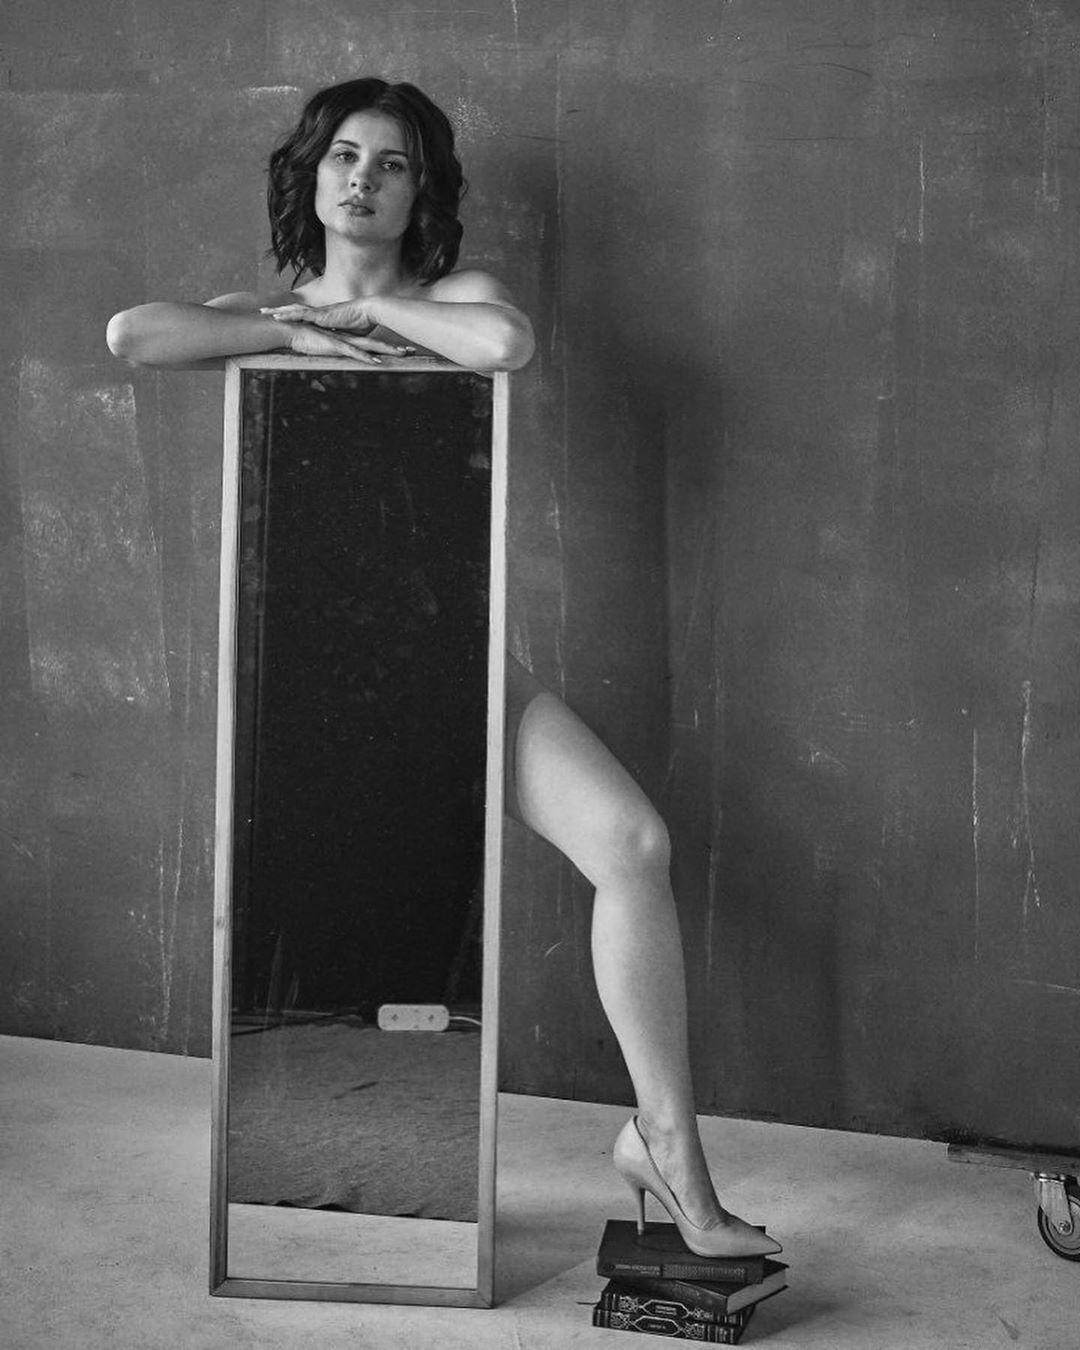 Анна Цуканова сексуально позирует на камеру (Instagram Анны Цукановой-Кот)